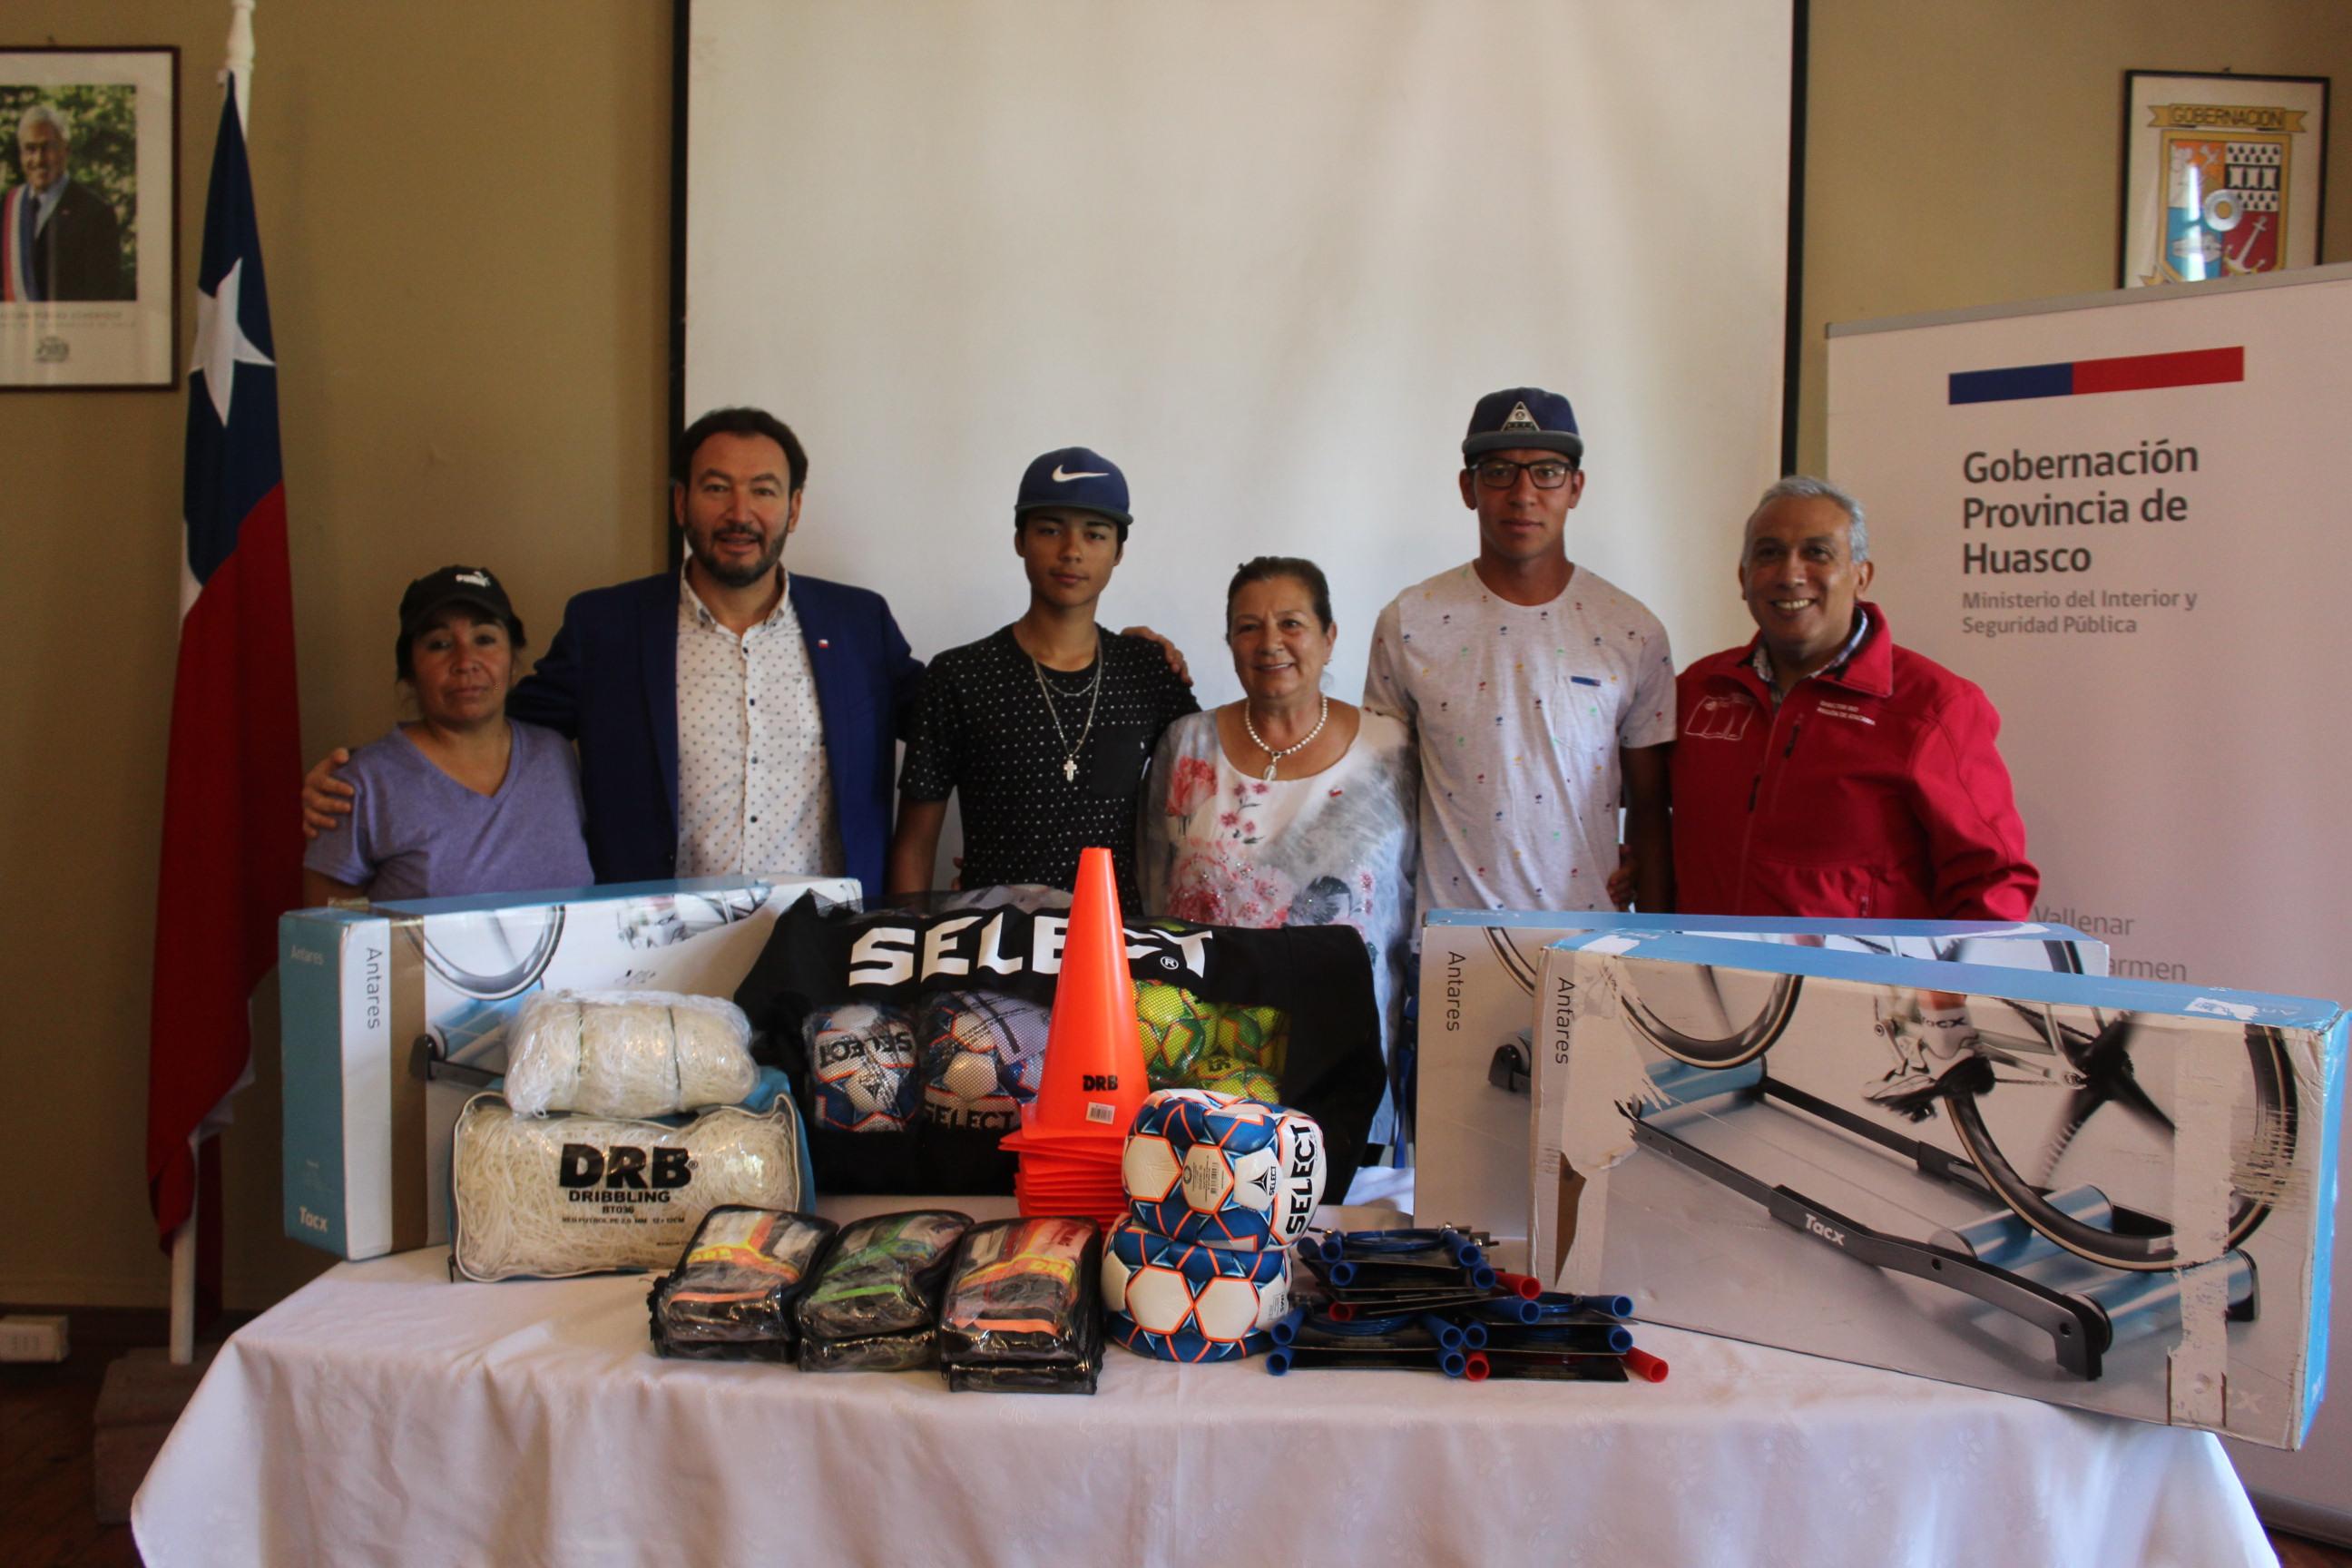 Clubes de Vallenar reciben implementación deportiva para realizar talleres formativos